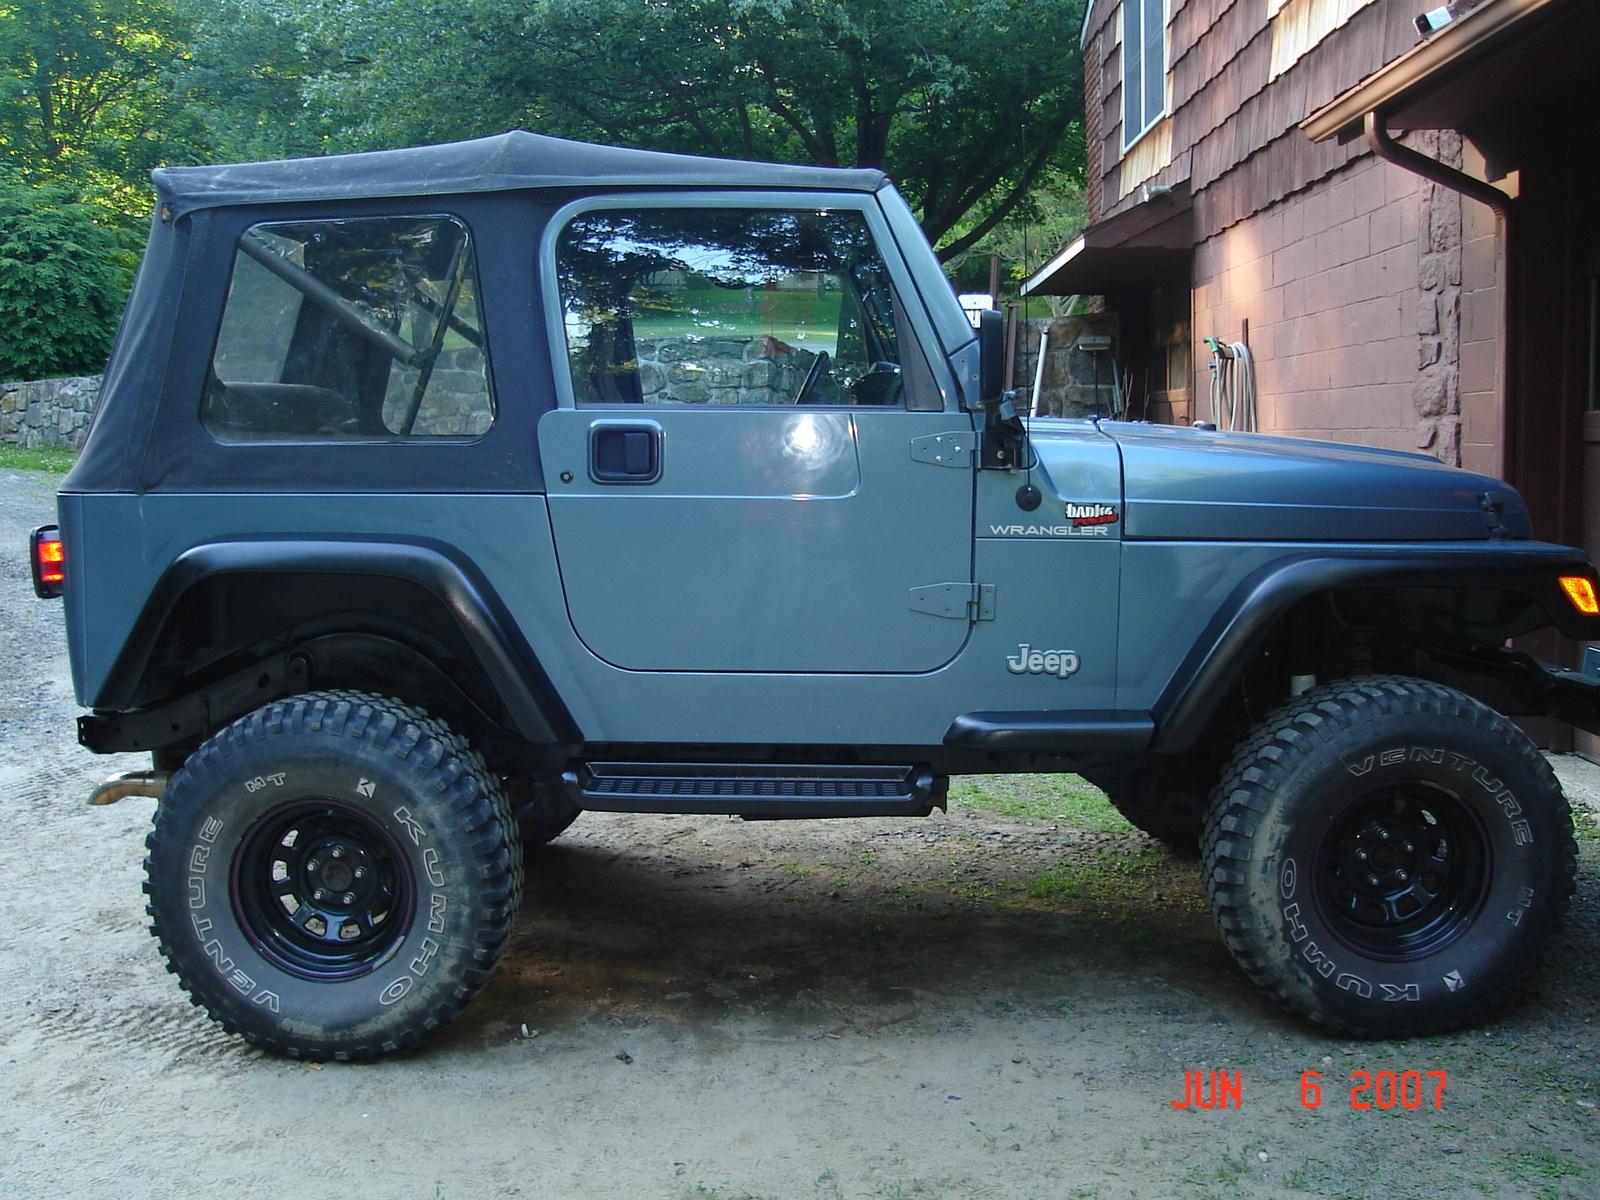 1997 Jeep Wrangler - Pictures - CarGurus